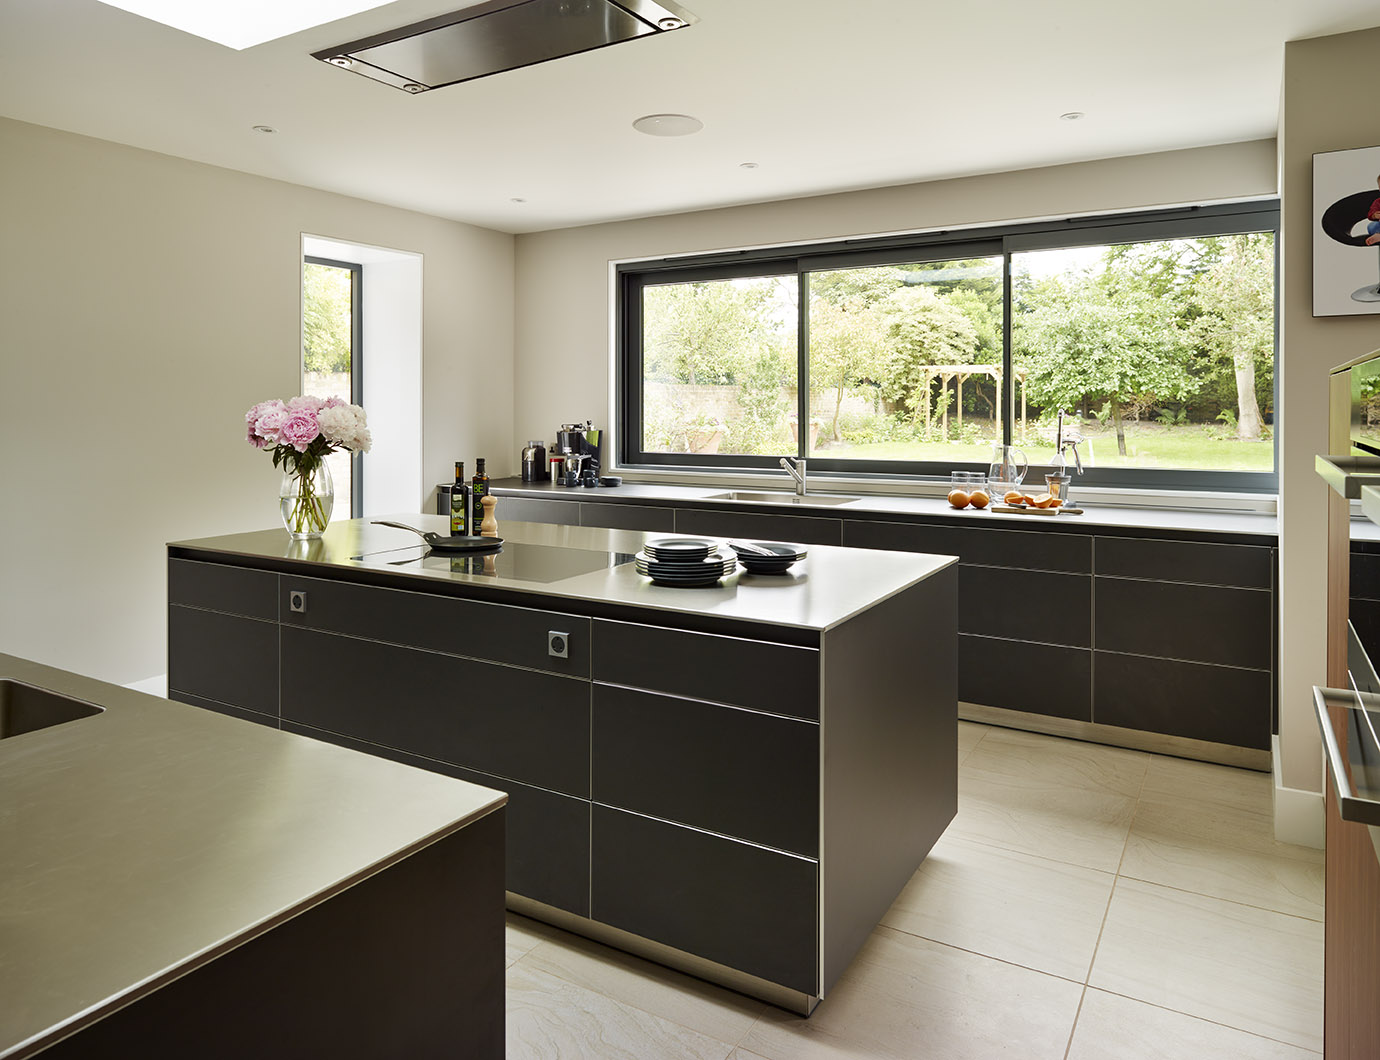 Bulthaup B3 Keuken : B bulthaup at kitchen architecture bulthaup kitchenarchitecture